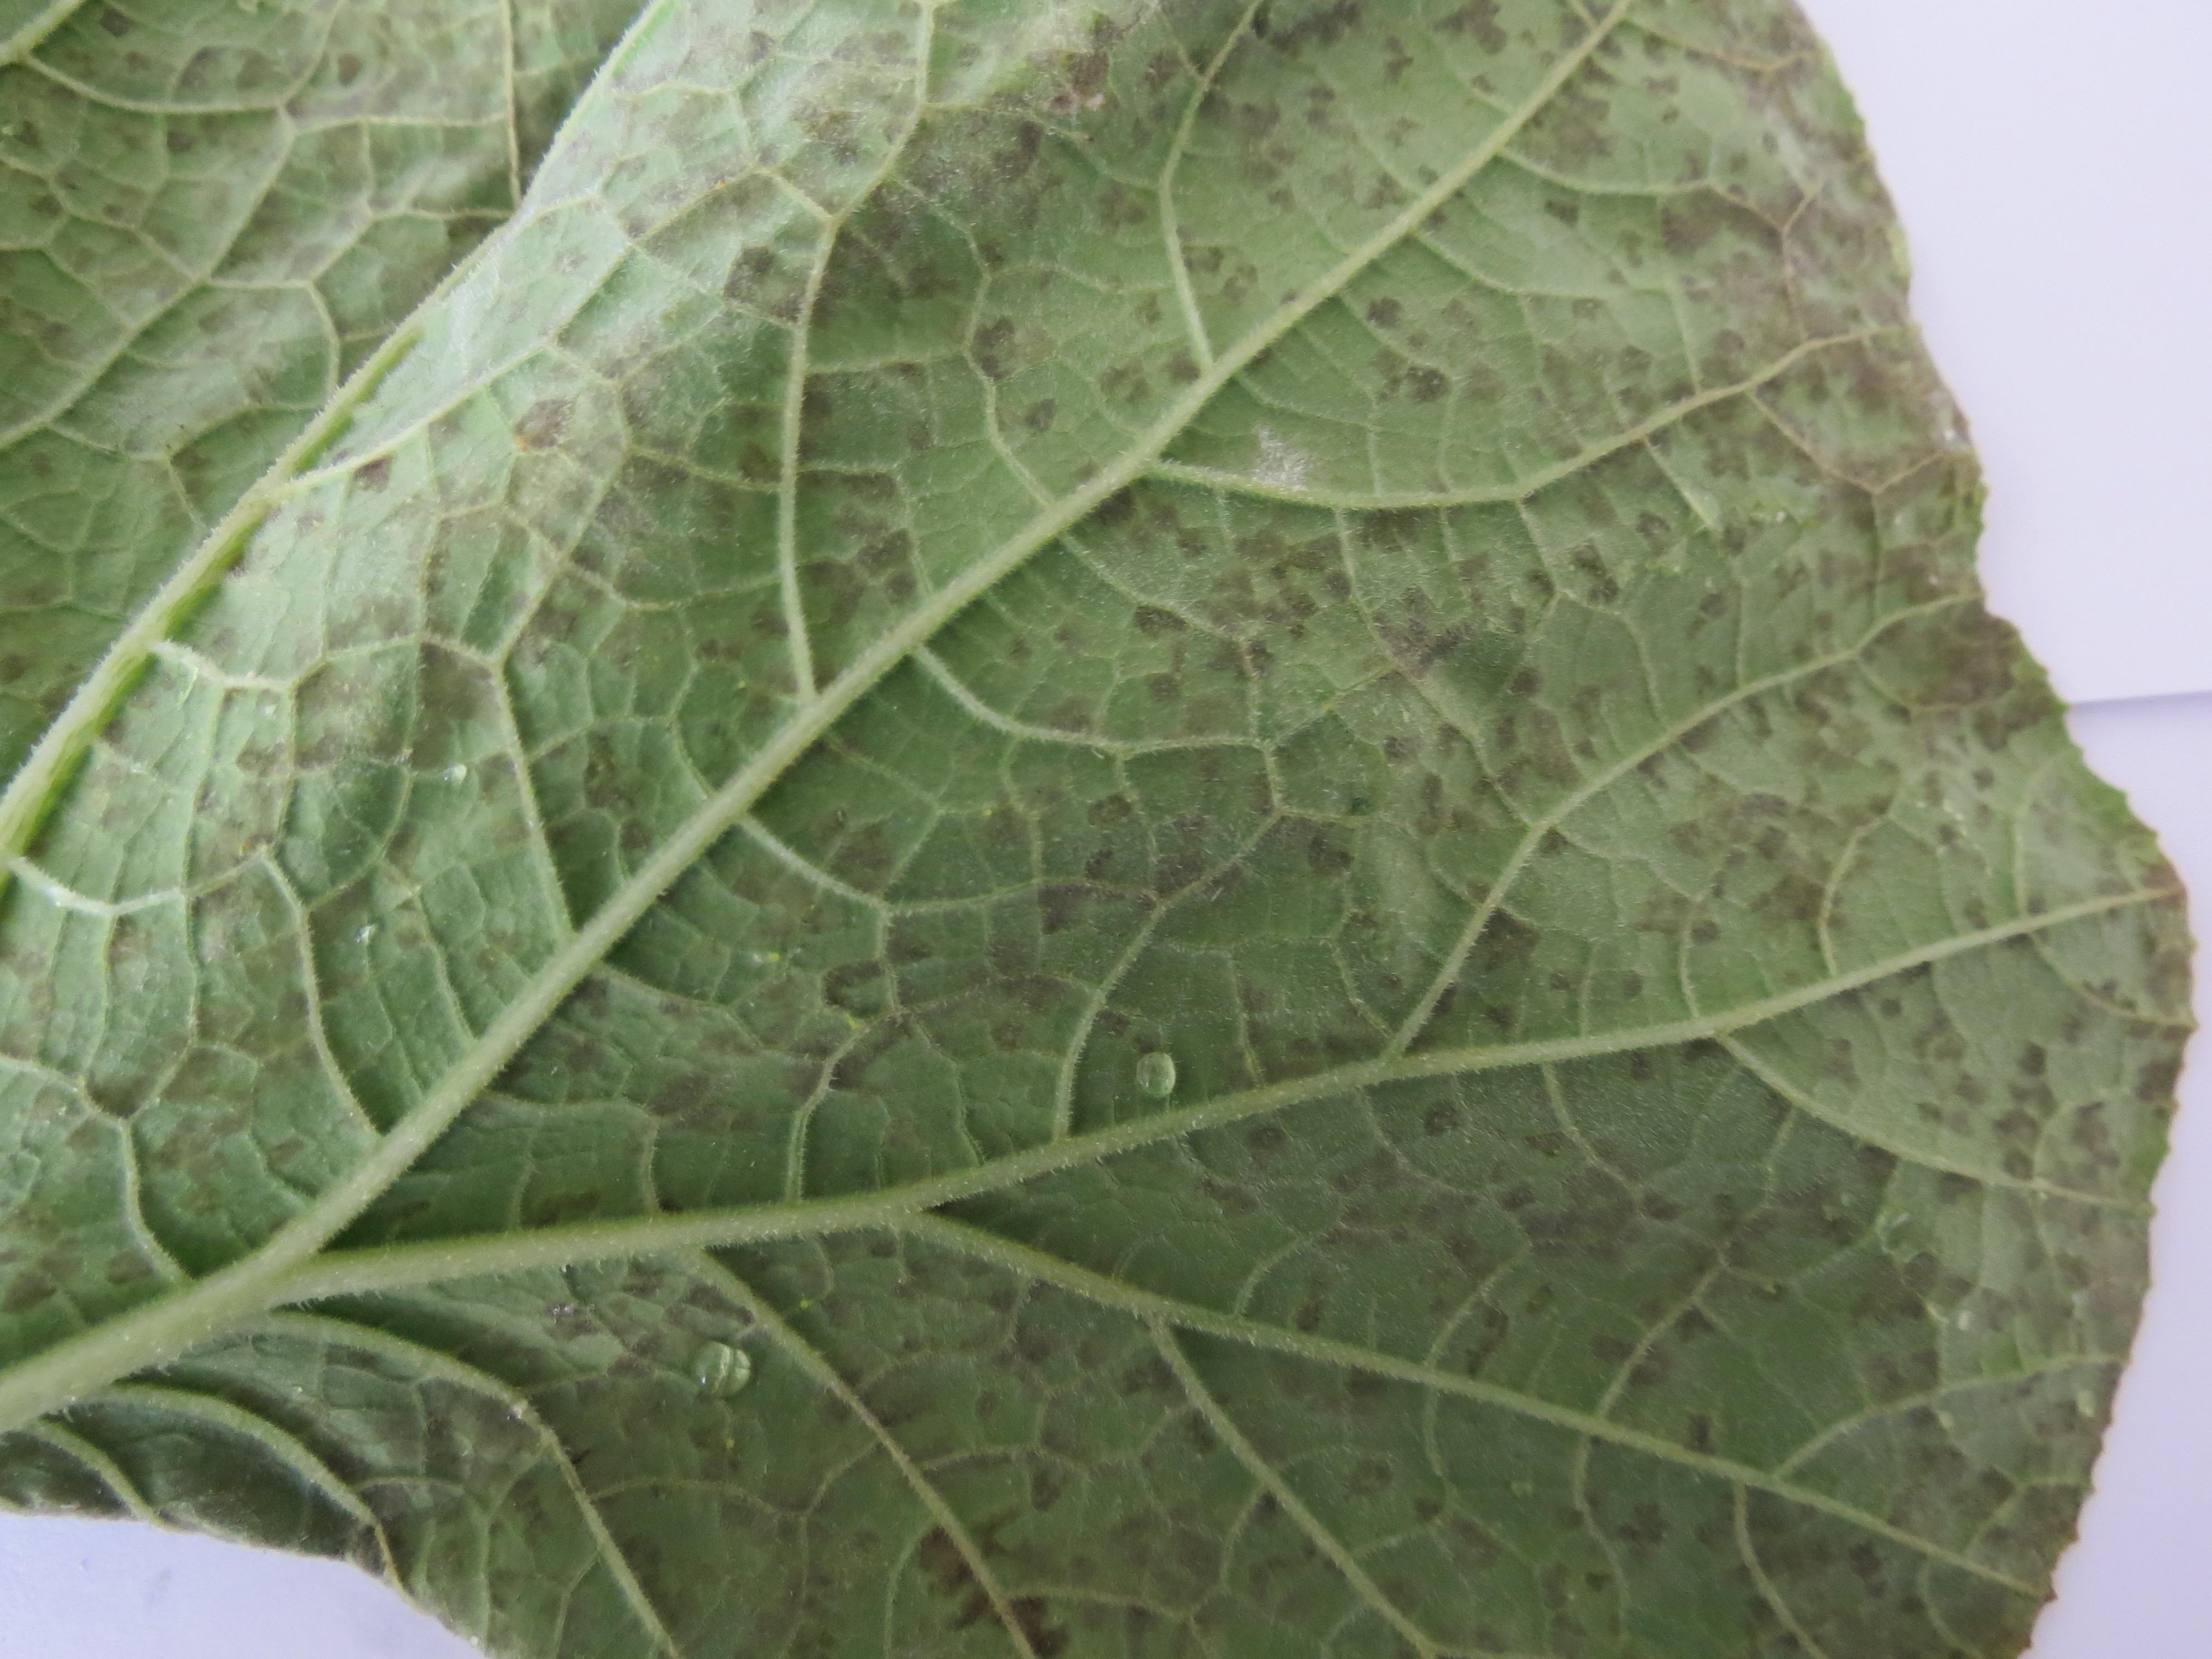 Close-up of cucurbit downy mildew symptoms on backside of gourd leaf (Photo Dr. Lina Quesada, NCSU Vegetable Pathology Lab)